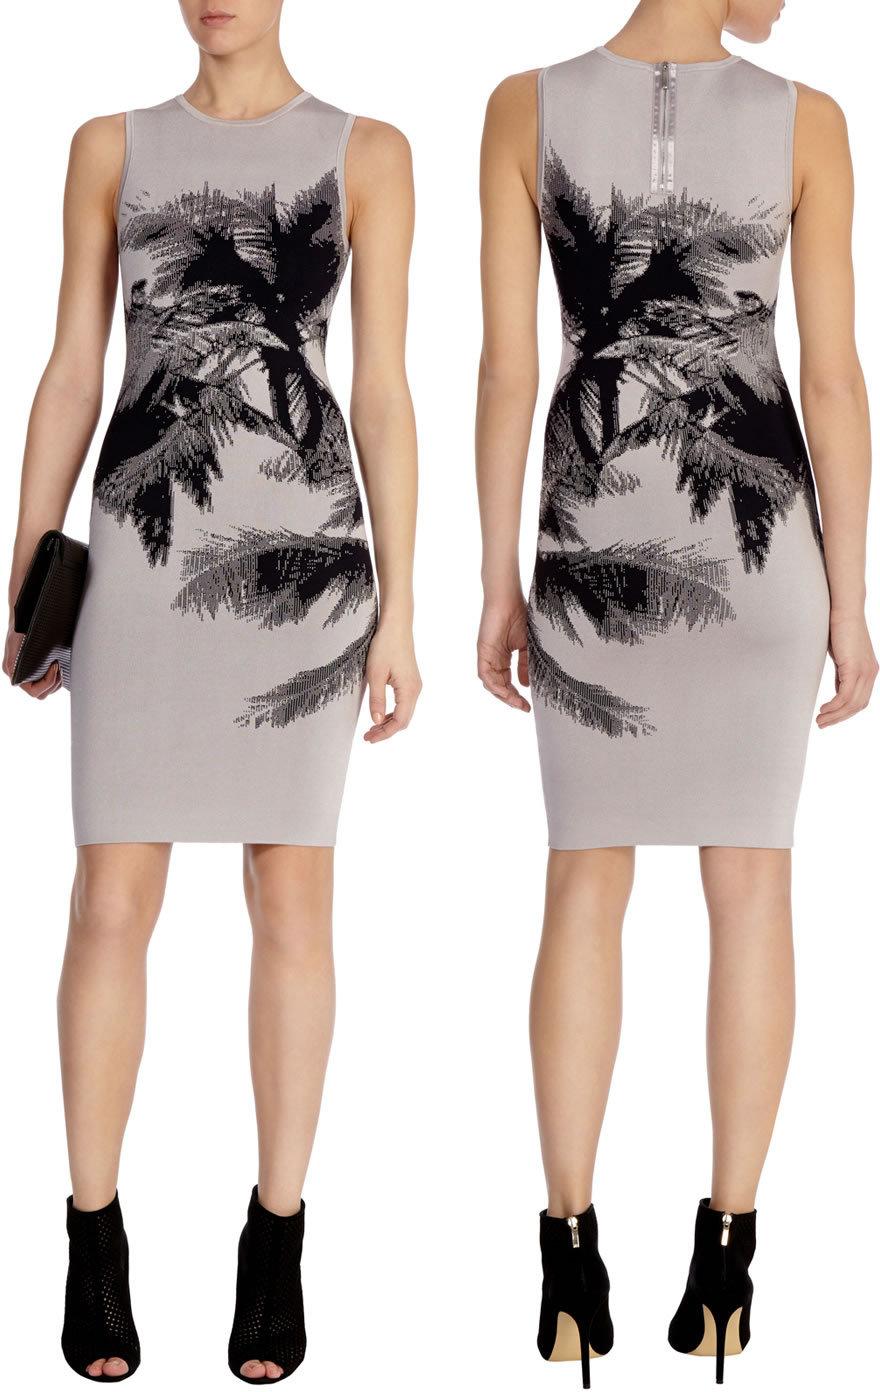 Fashion Women Palm Tree Print Dress Elegant Mini Party Dresses 6952Одежда и ак�е��уары<br><br><br>Aliexpress